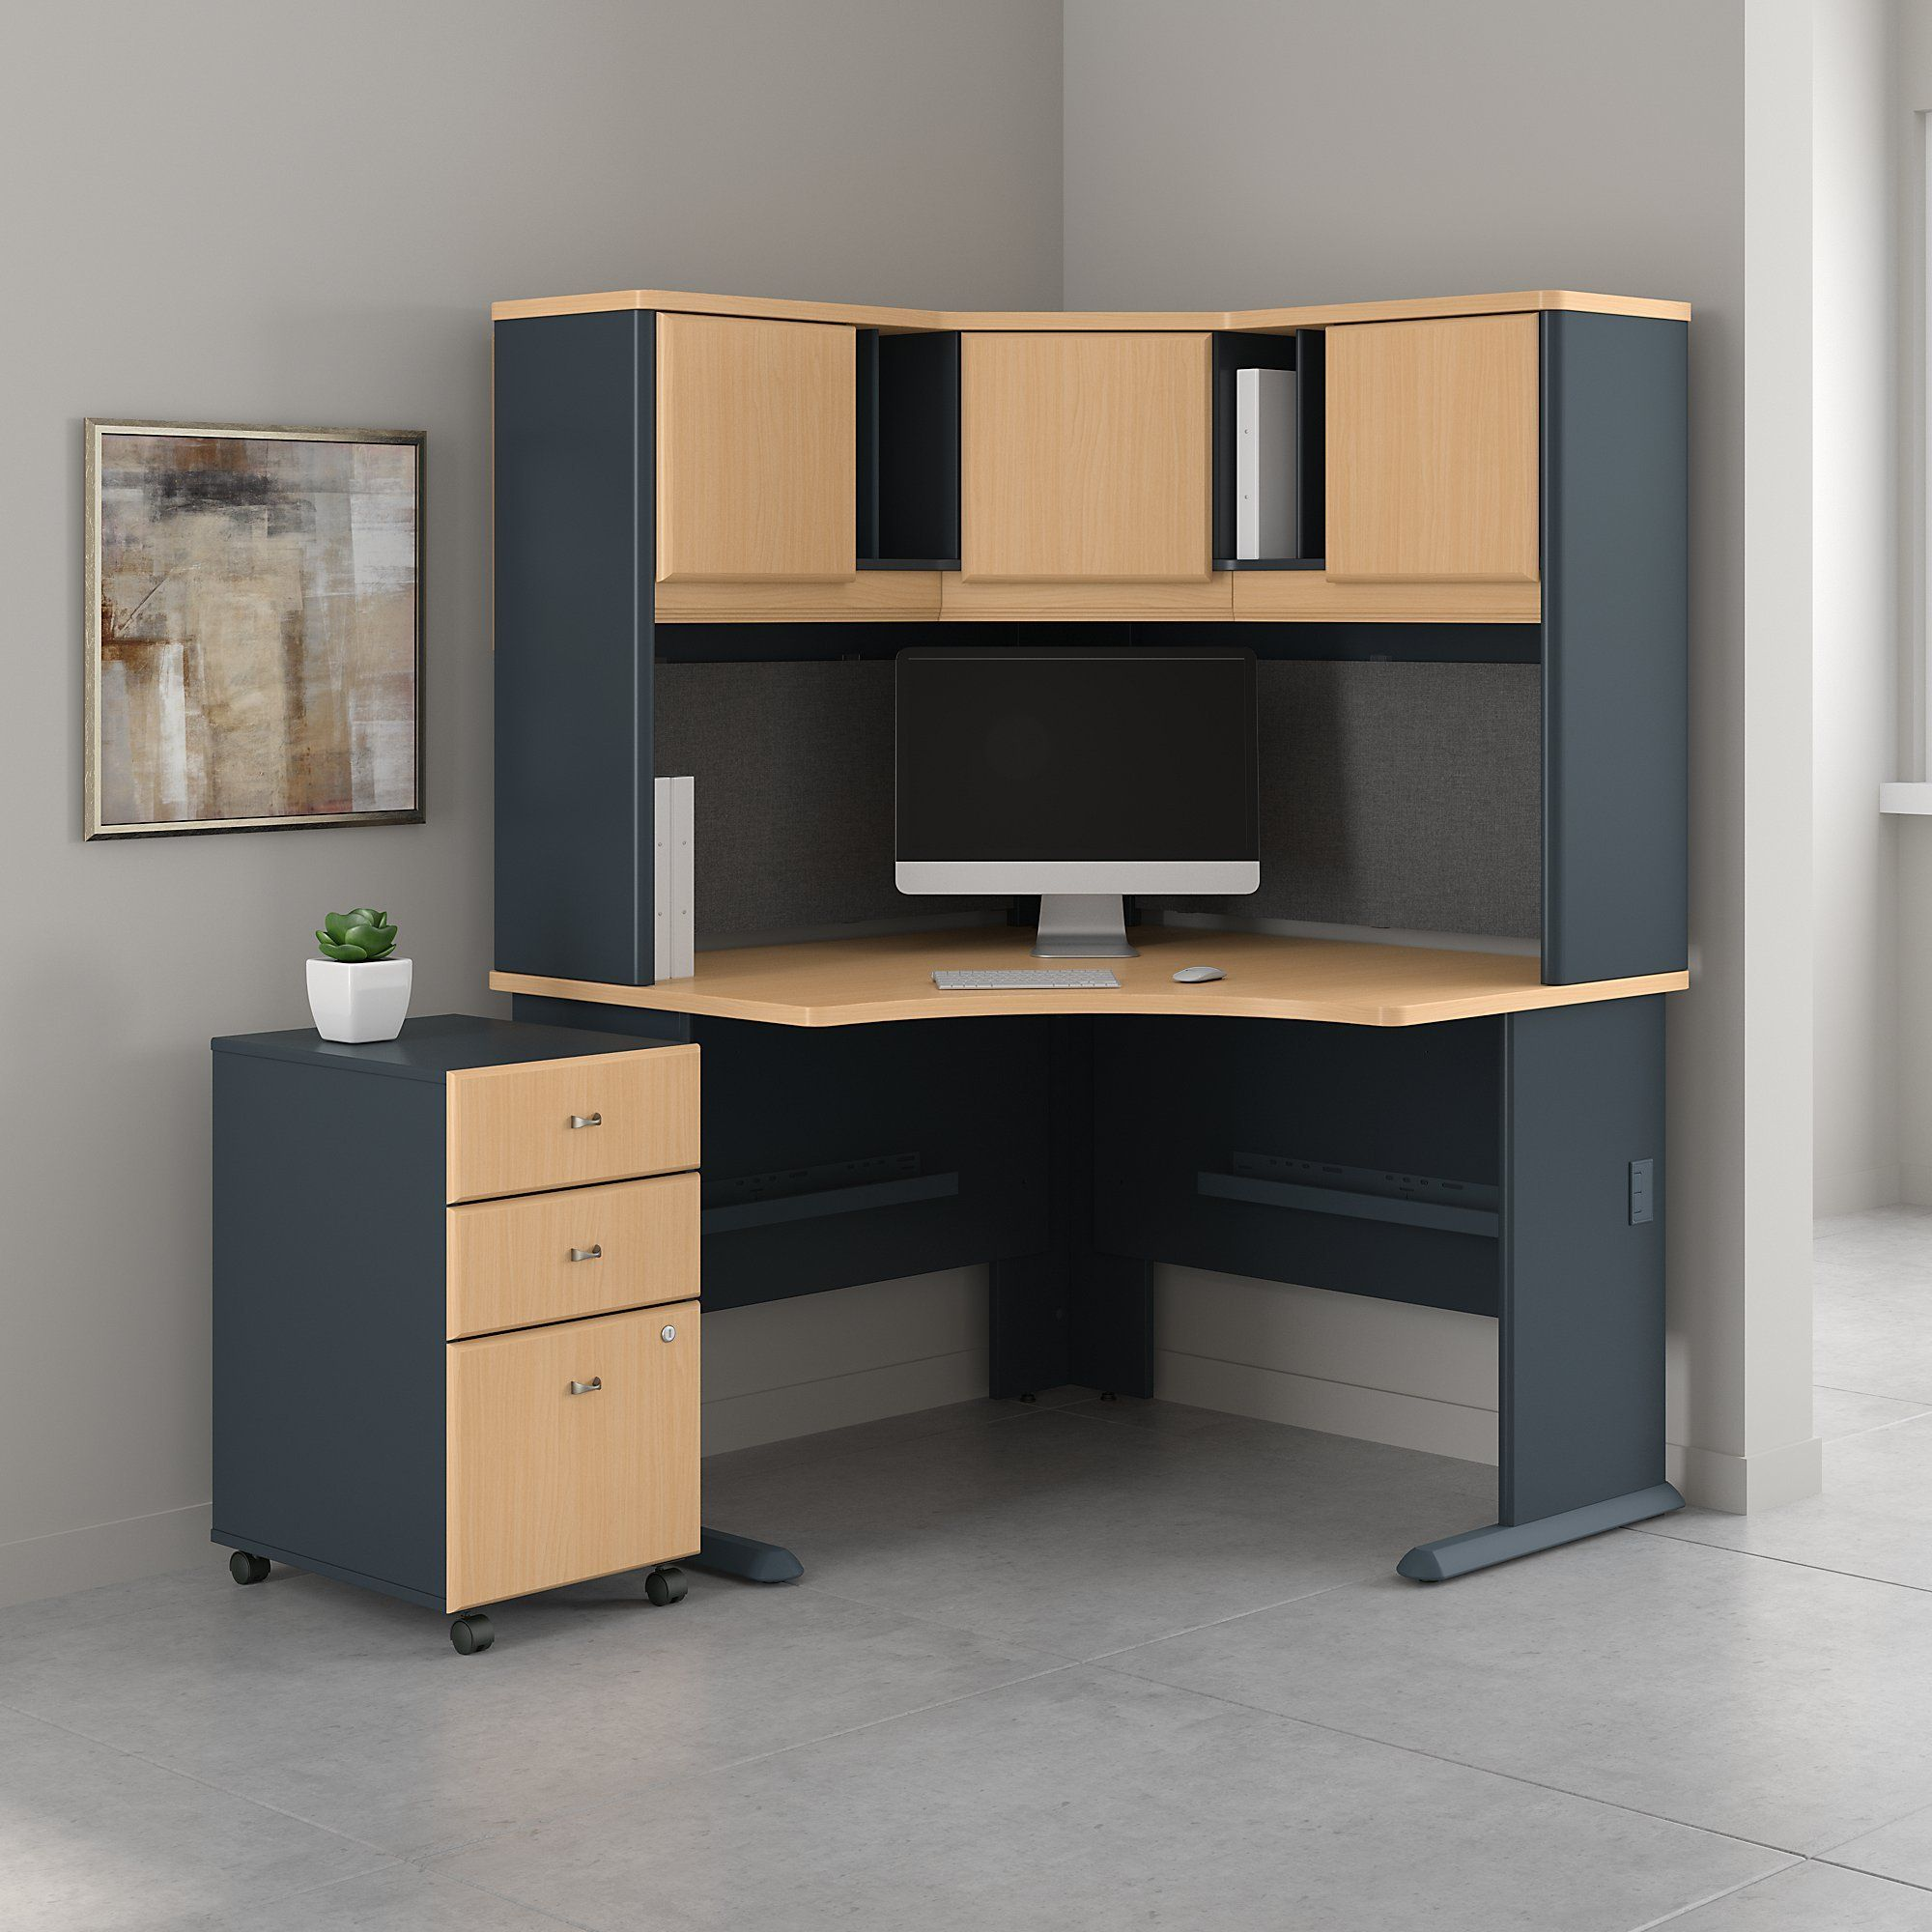 series corner desk. Bush Business Furniture SRA040BESU Series A 48W Corner Desk With Hutch And Mobile File Cabinet Beech D